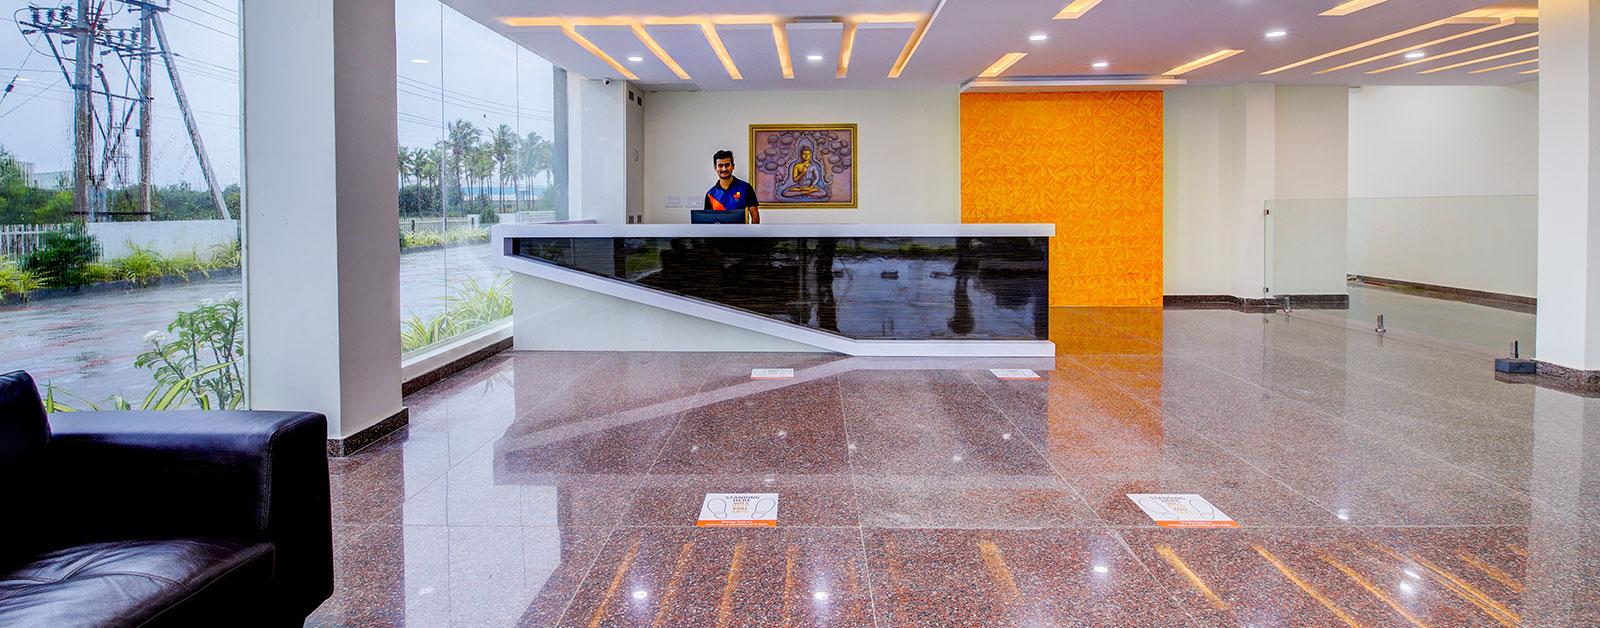 hotels in kolar karnataka